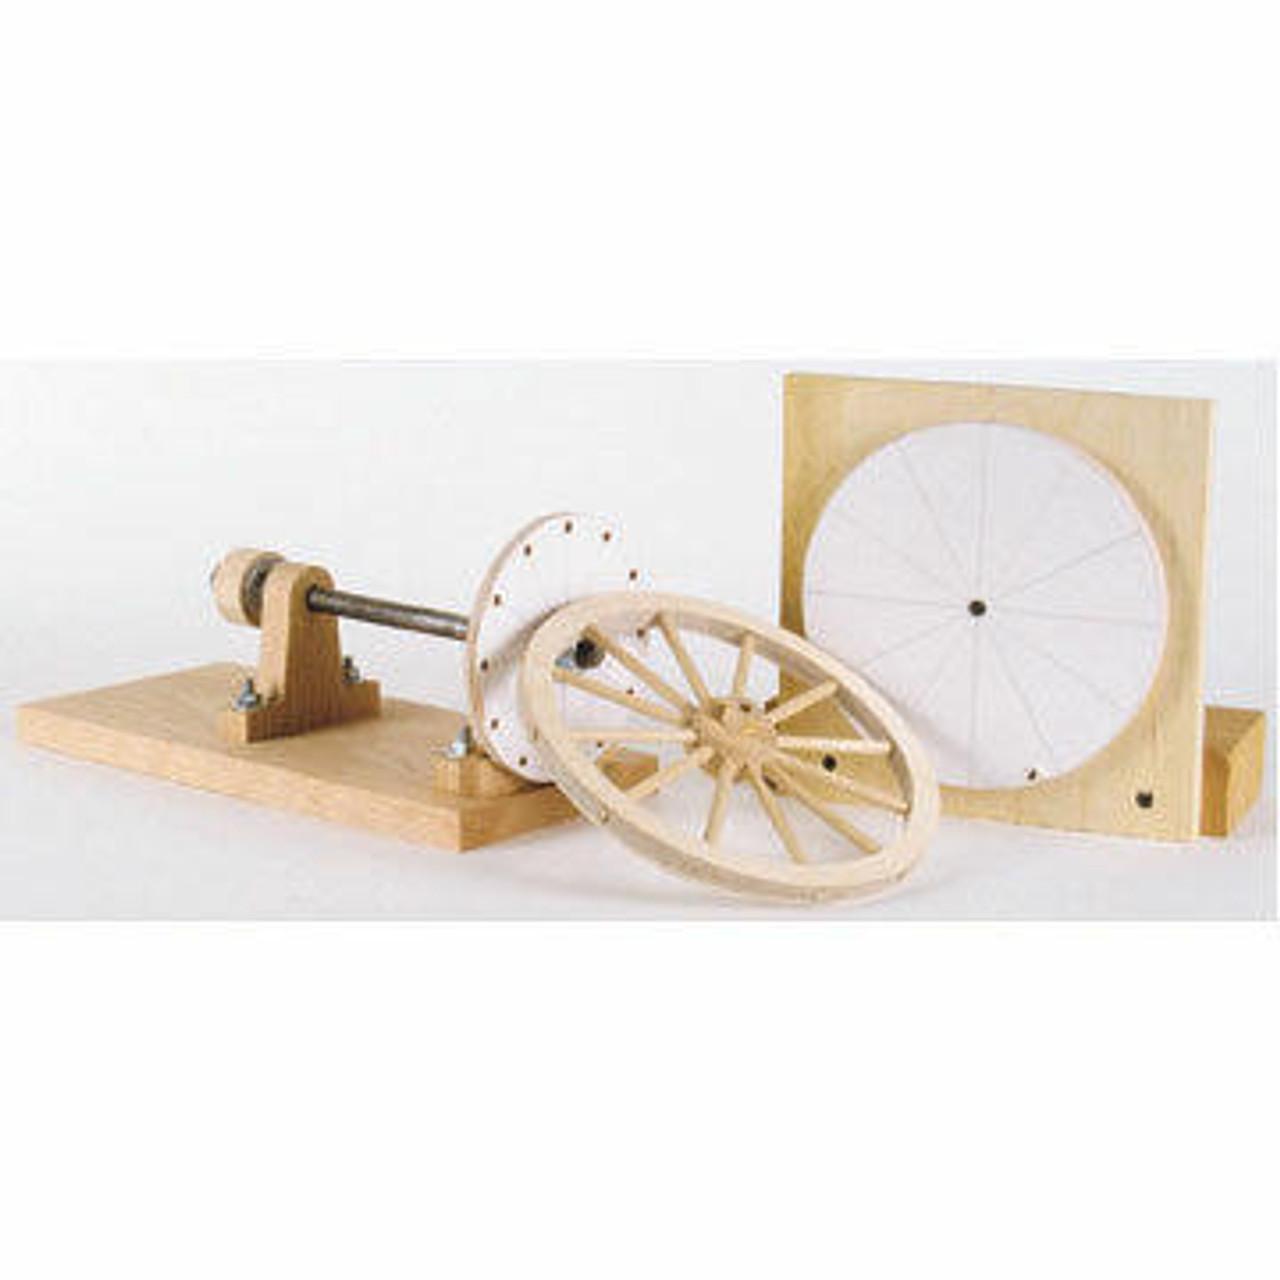 Cherry Tree Toys Wheel Maker Jig Parts Kit